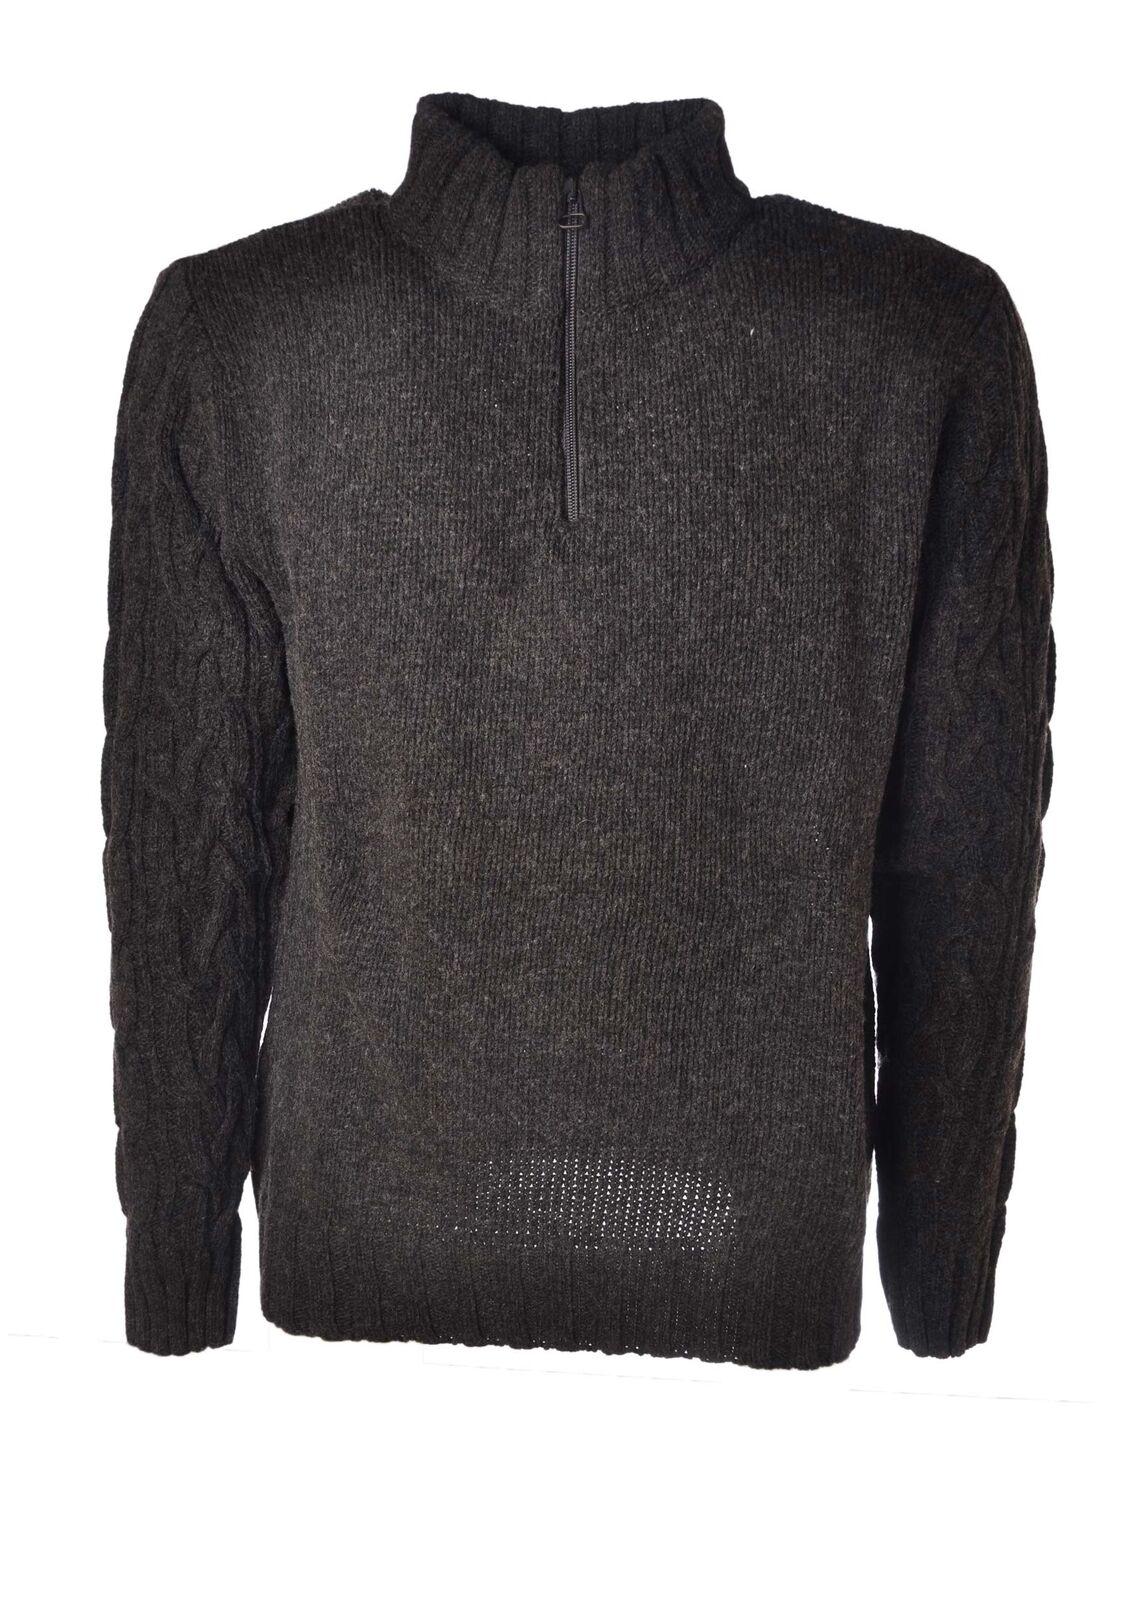 Brooksfield - Knitwear-Sweaters - Man - Grau - 4530113L184209